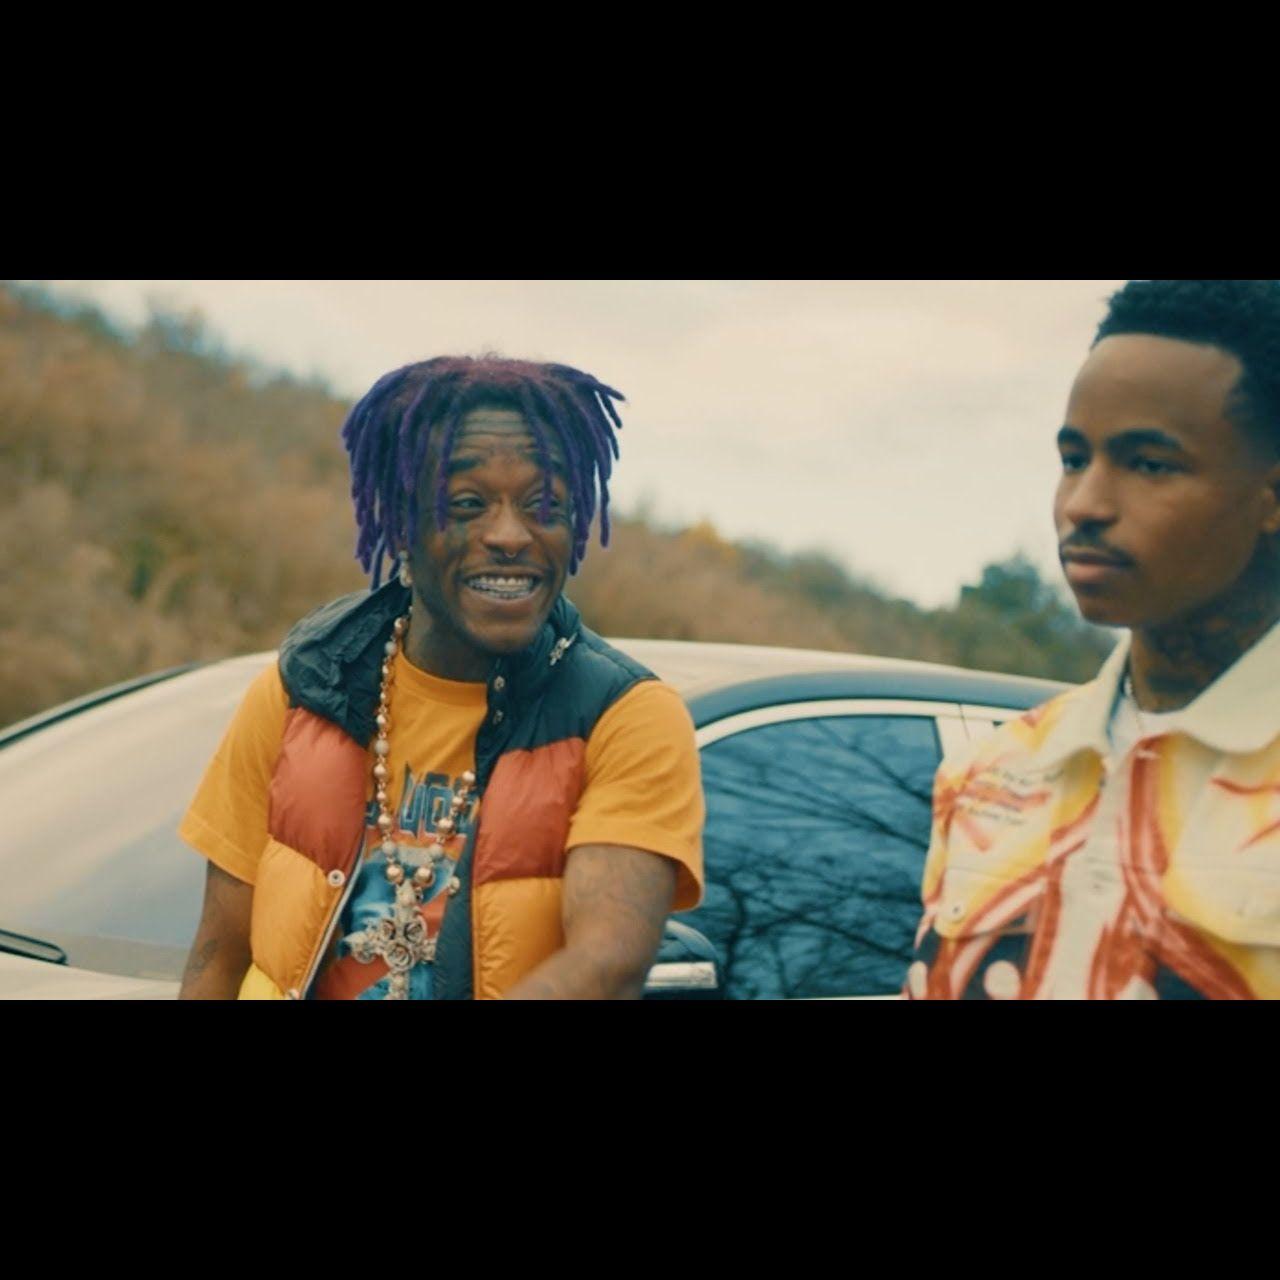 Popp Hunna - Adderall (Corvette Corvette) (Remix) (ft. Lil Uzi Vert) (Thumbnail)